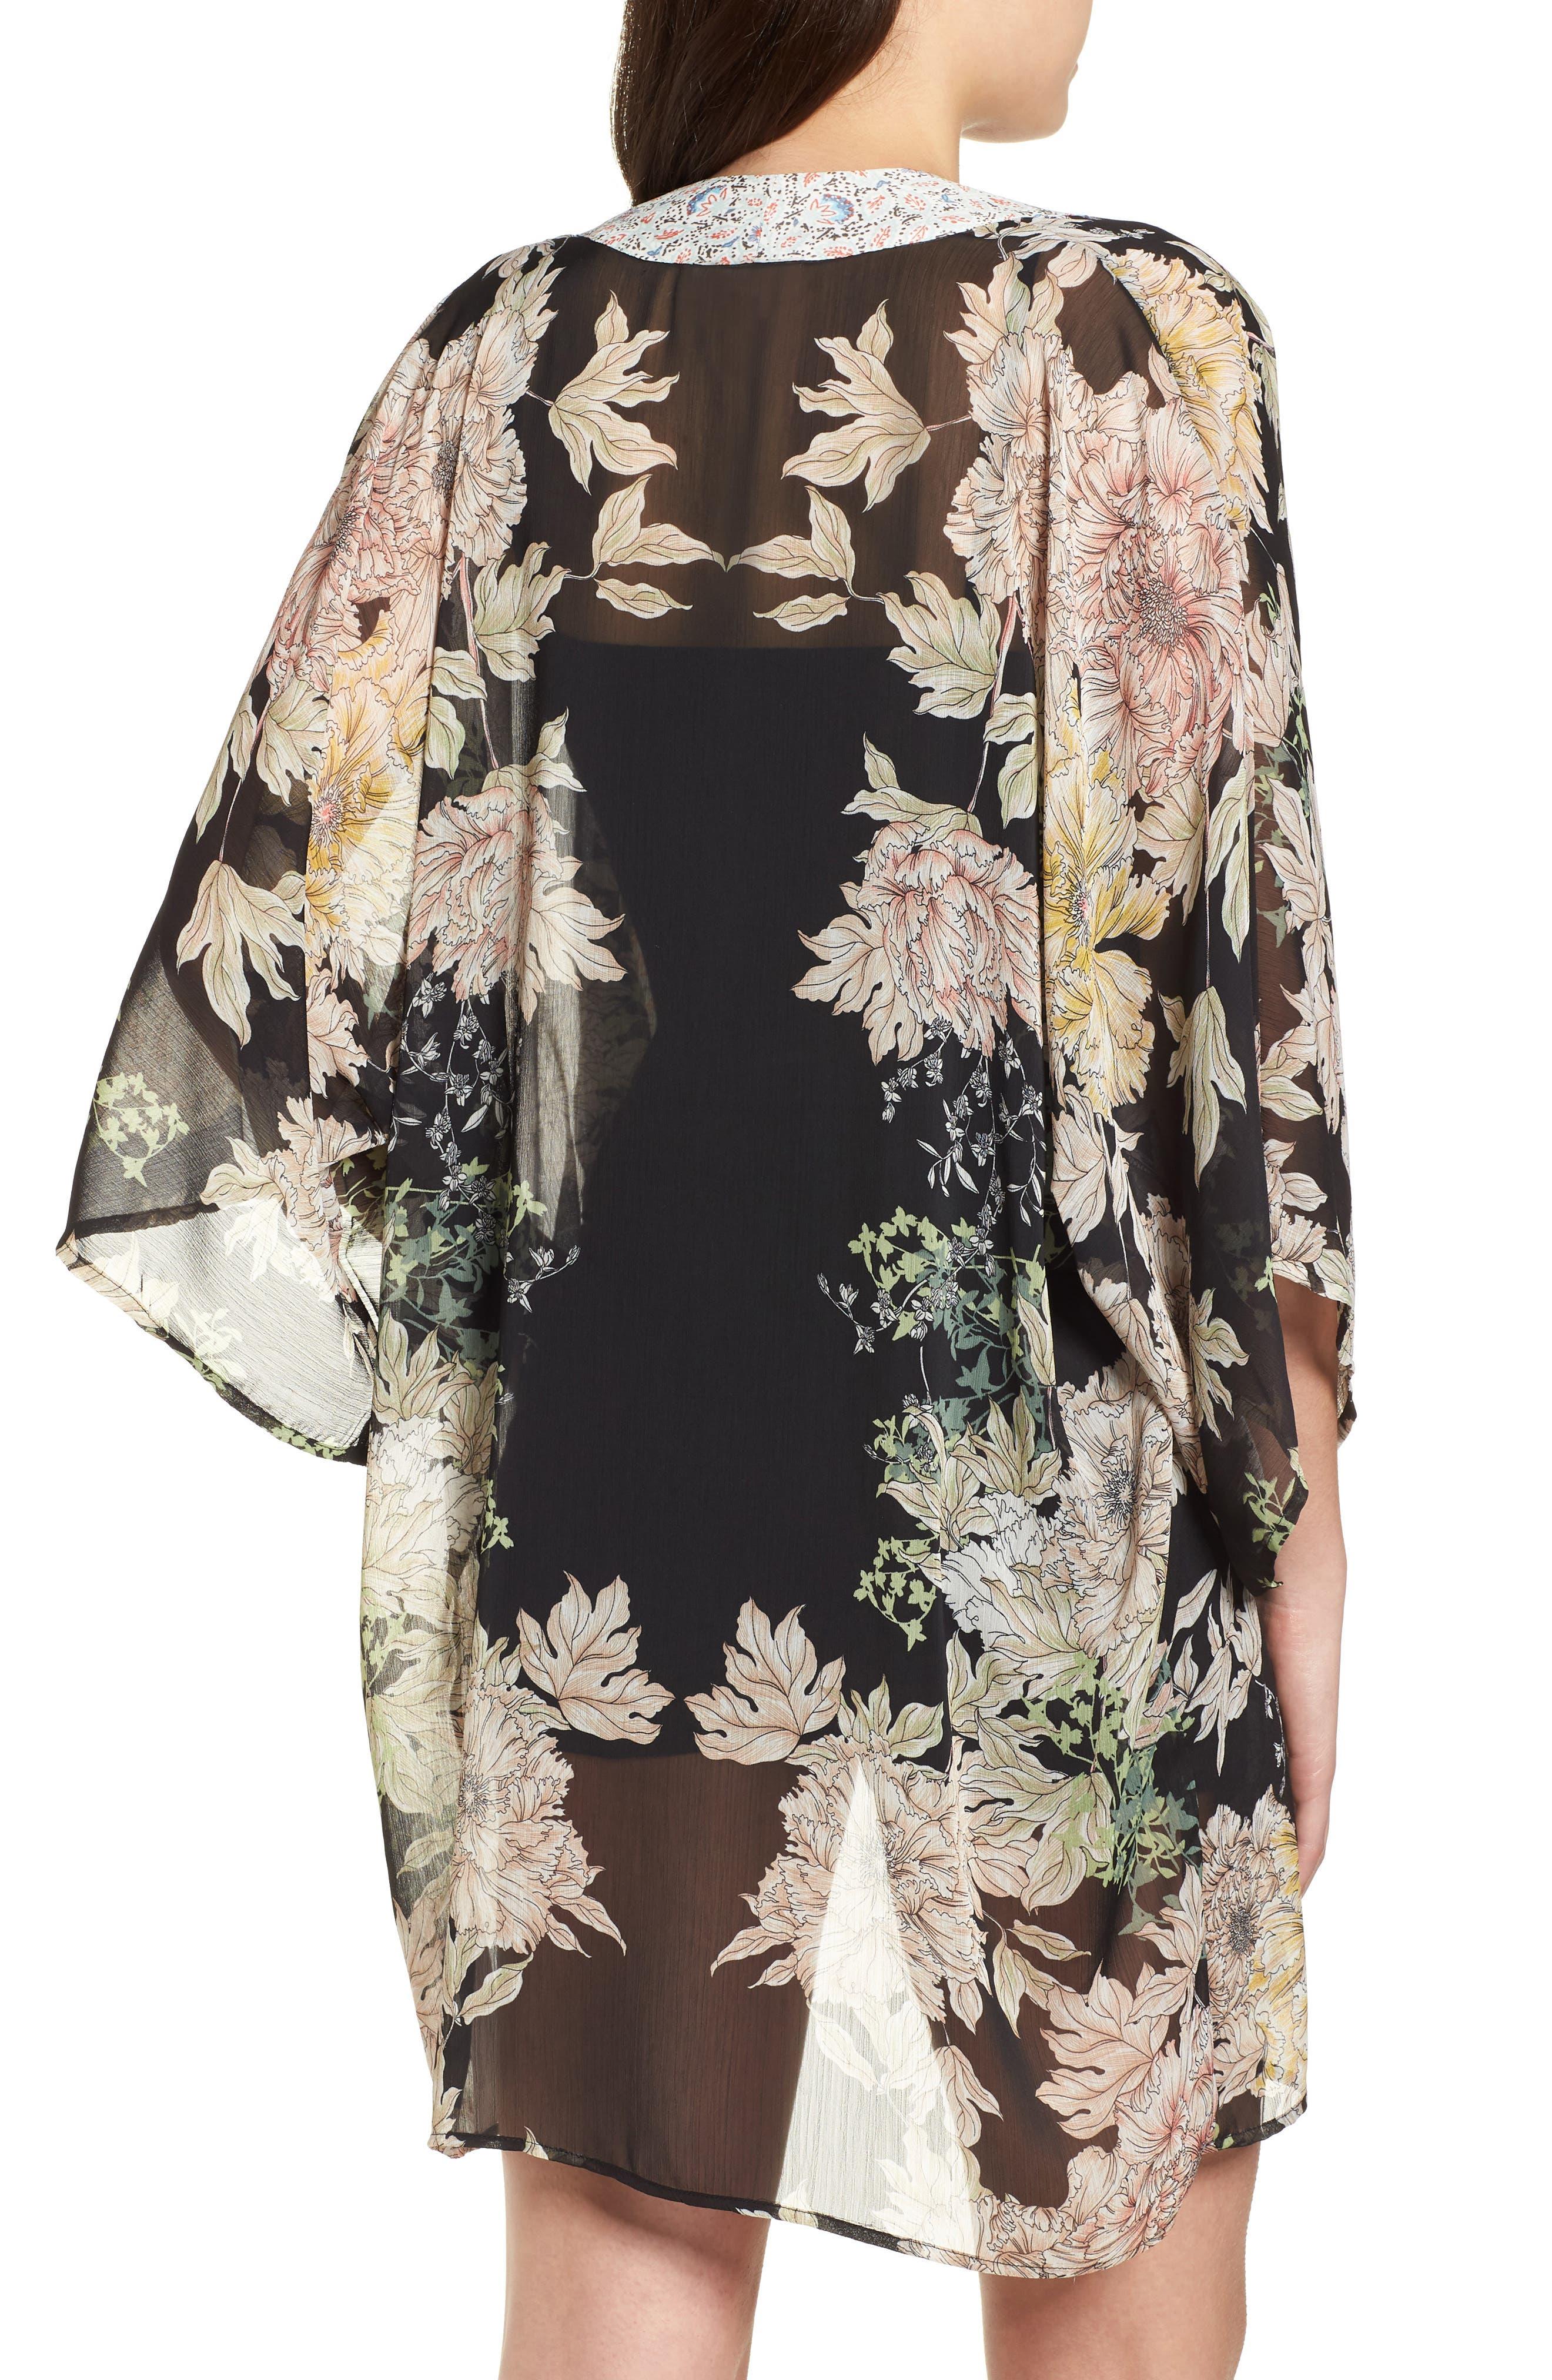 Floral Print Kimono,                             Alternate thumbnail 2, color,                             Black Gold Pink